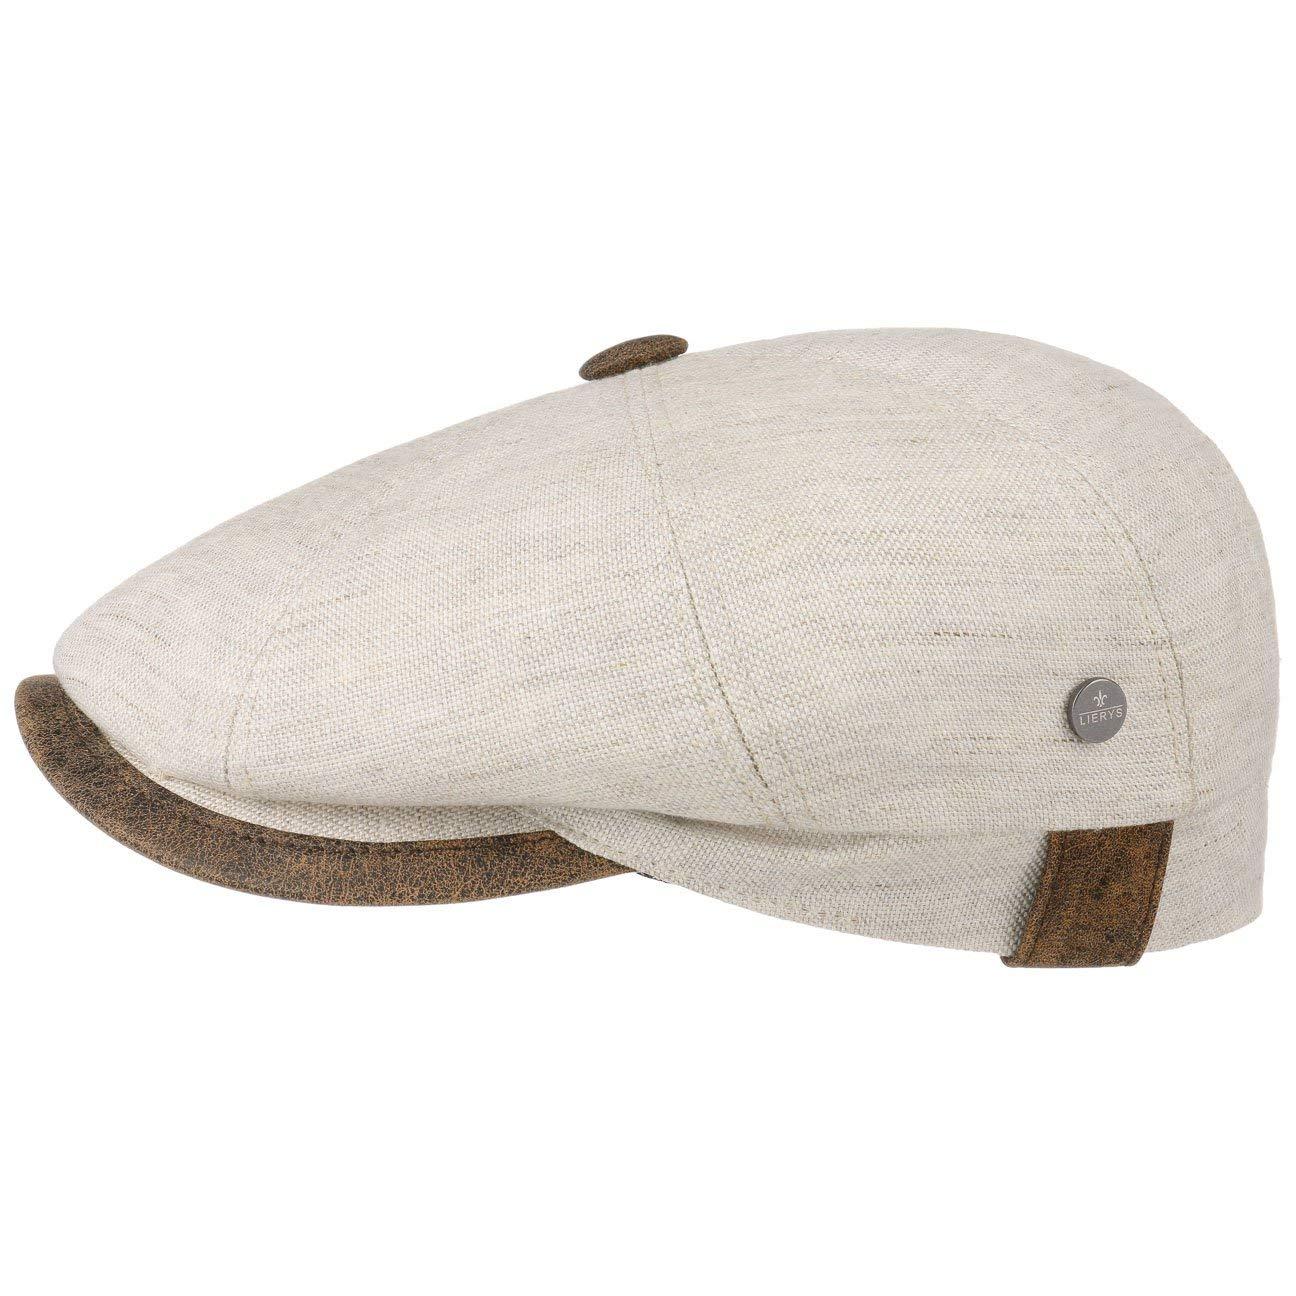 Lierys City Leather Piping Linen Cap Women/Men Nature-Brown 7 1/4 by Lierys